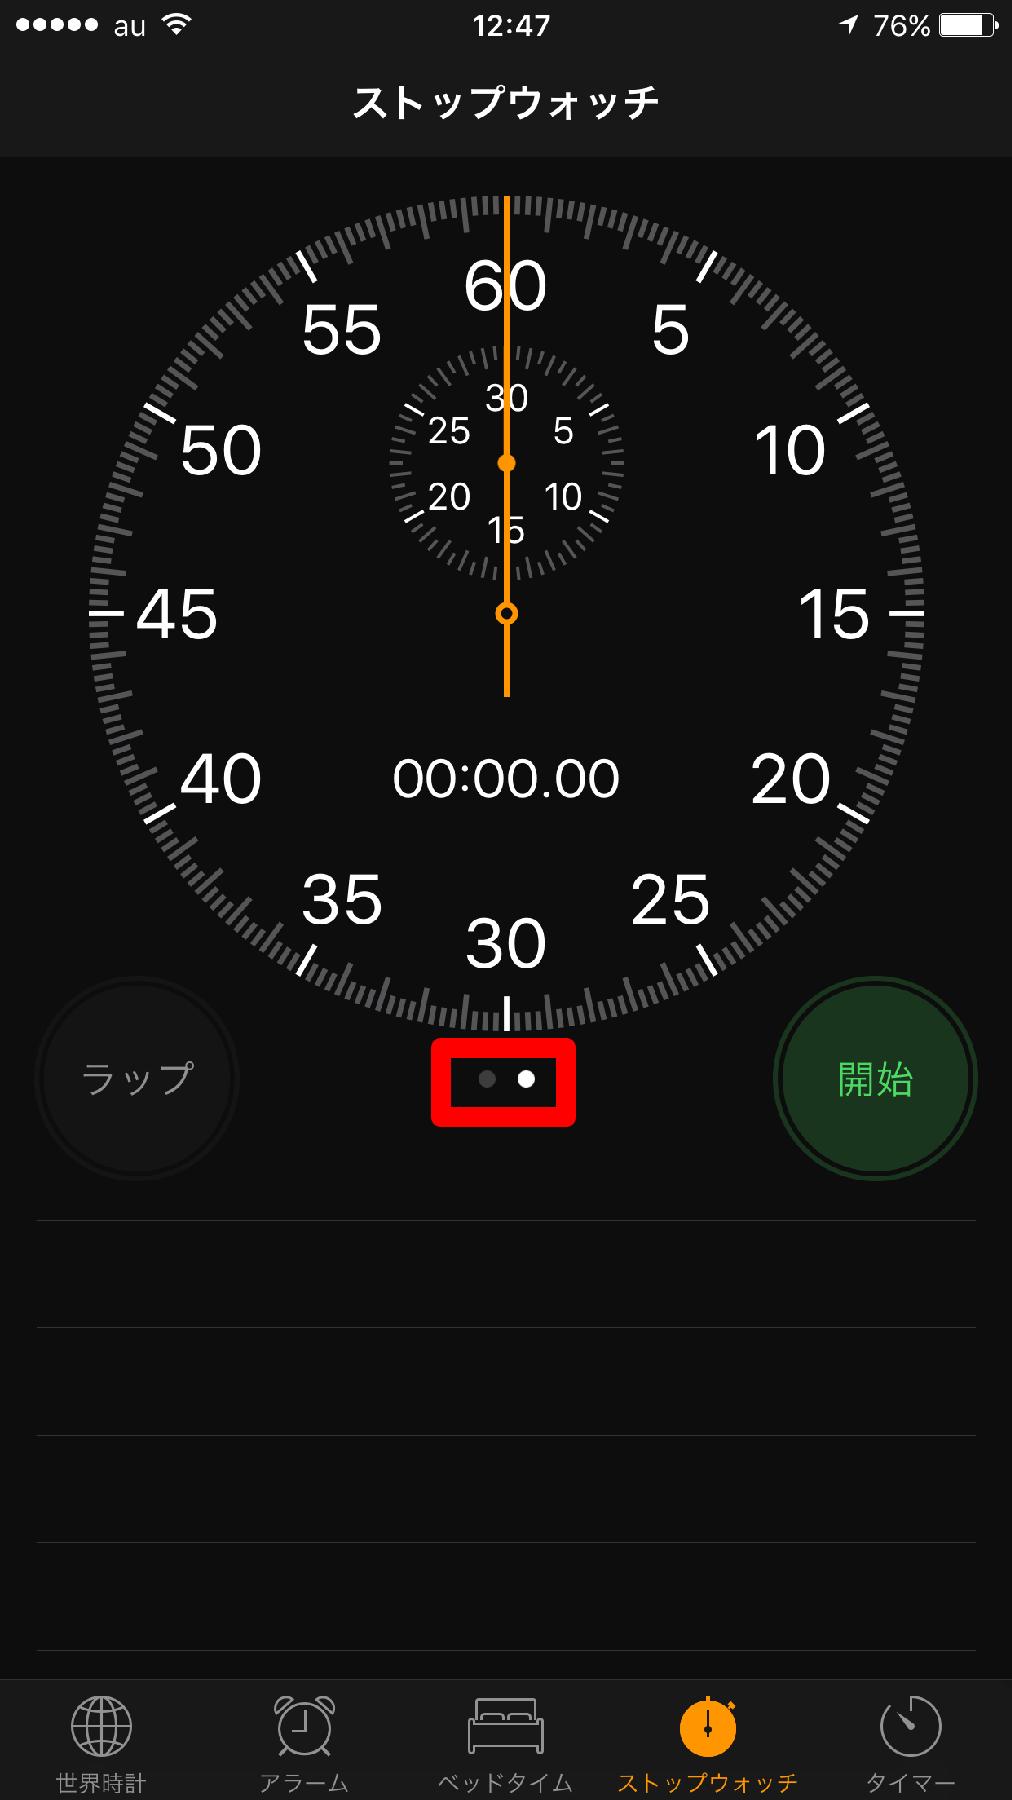 iPhoneの[時計]アプリのストップウォッチのアナログ表示画面